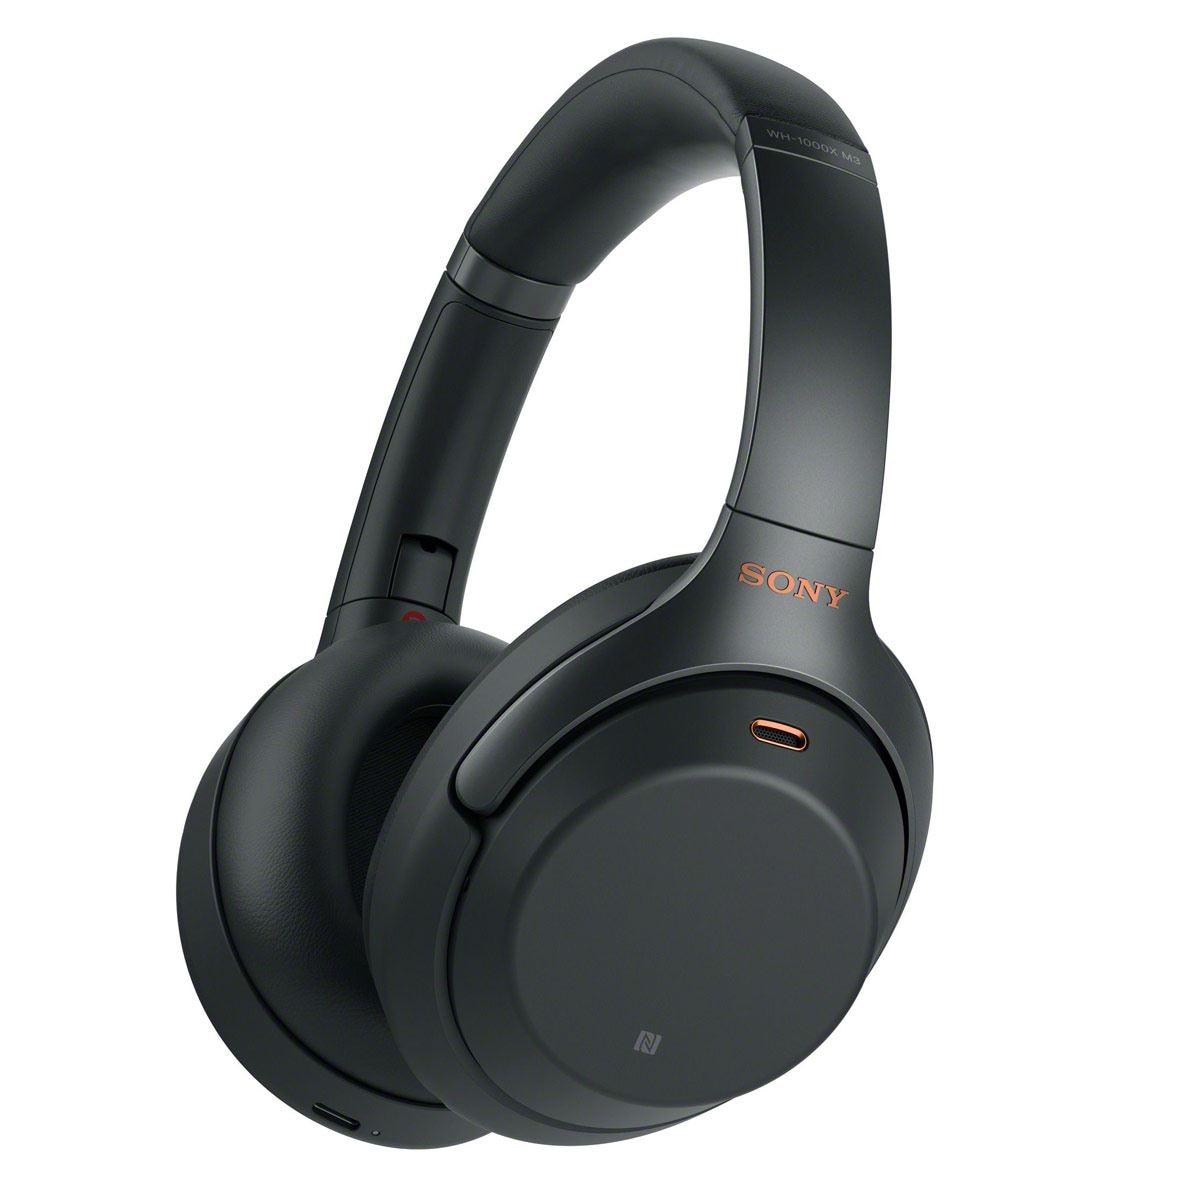 Audífonos Sony Inalámbricos Bluetooth Negros